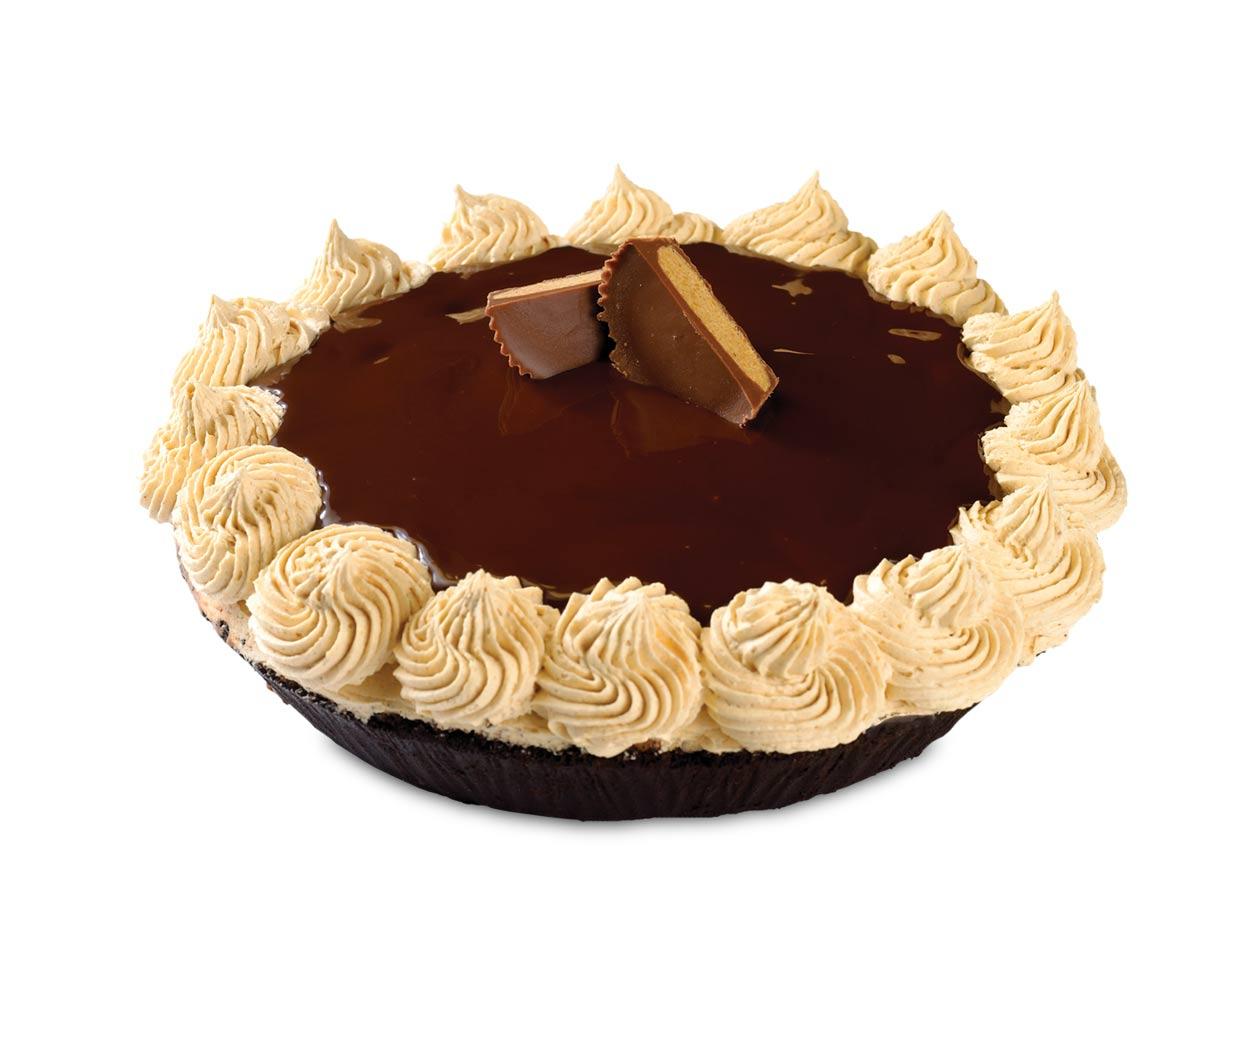 Chocolate Peanut Butter Pie Cold Stone Creamery